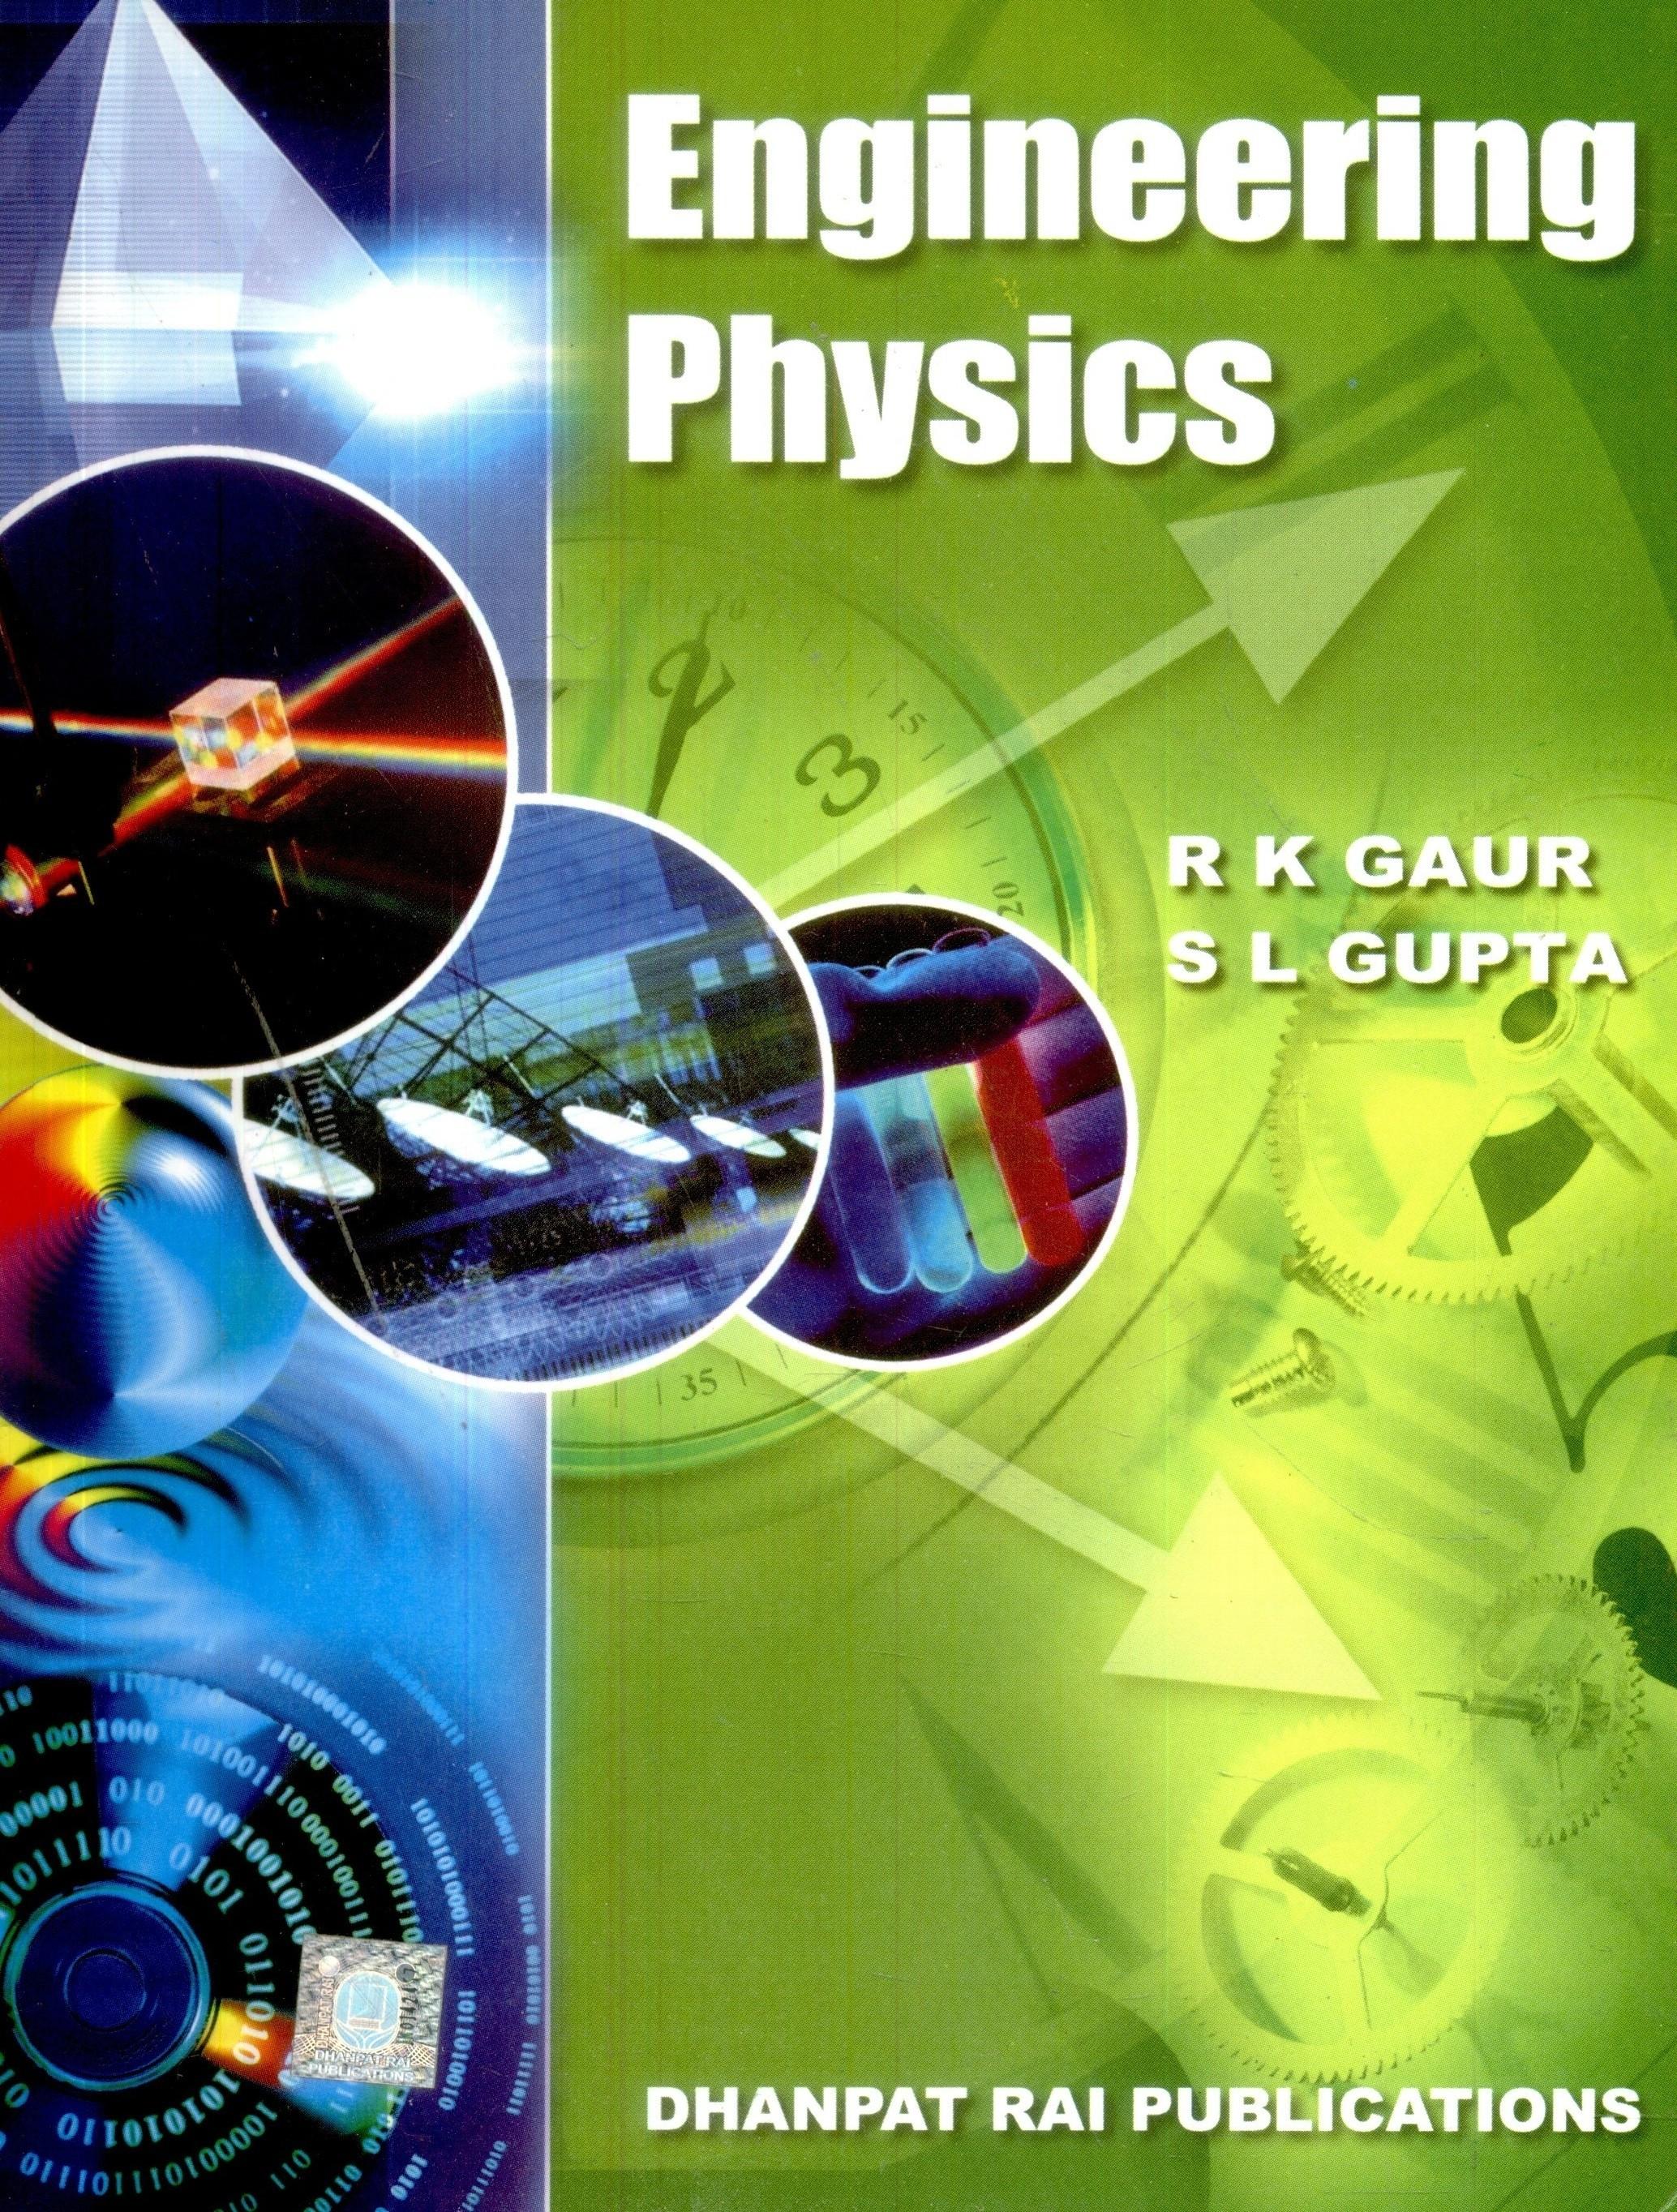 PDF Engineering Physics by Gaur and Gupta PDF Free Download